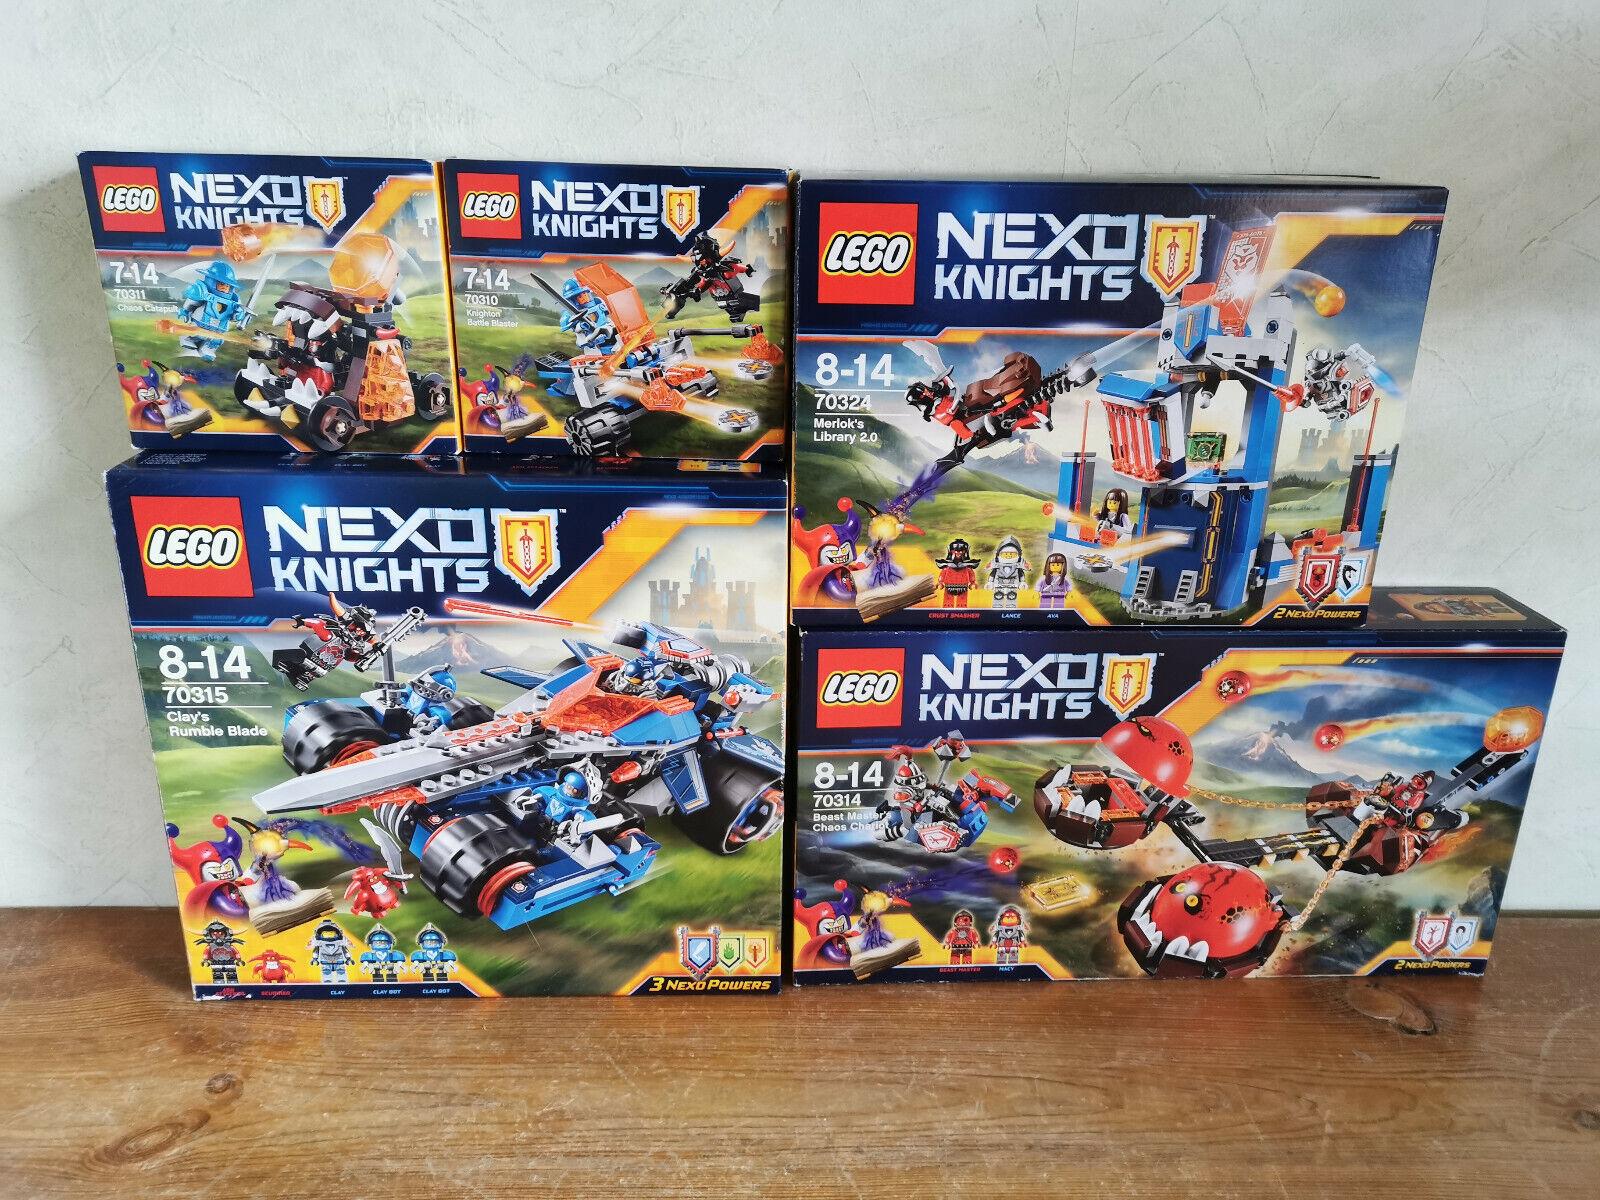 LEGO NEXO KNIGHTS  5 Sets - 70310, 70311, 70314, 70314, 70324